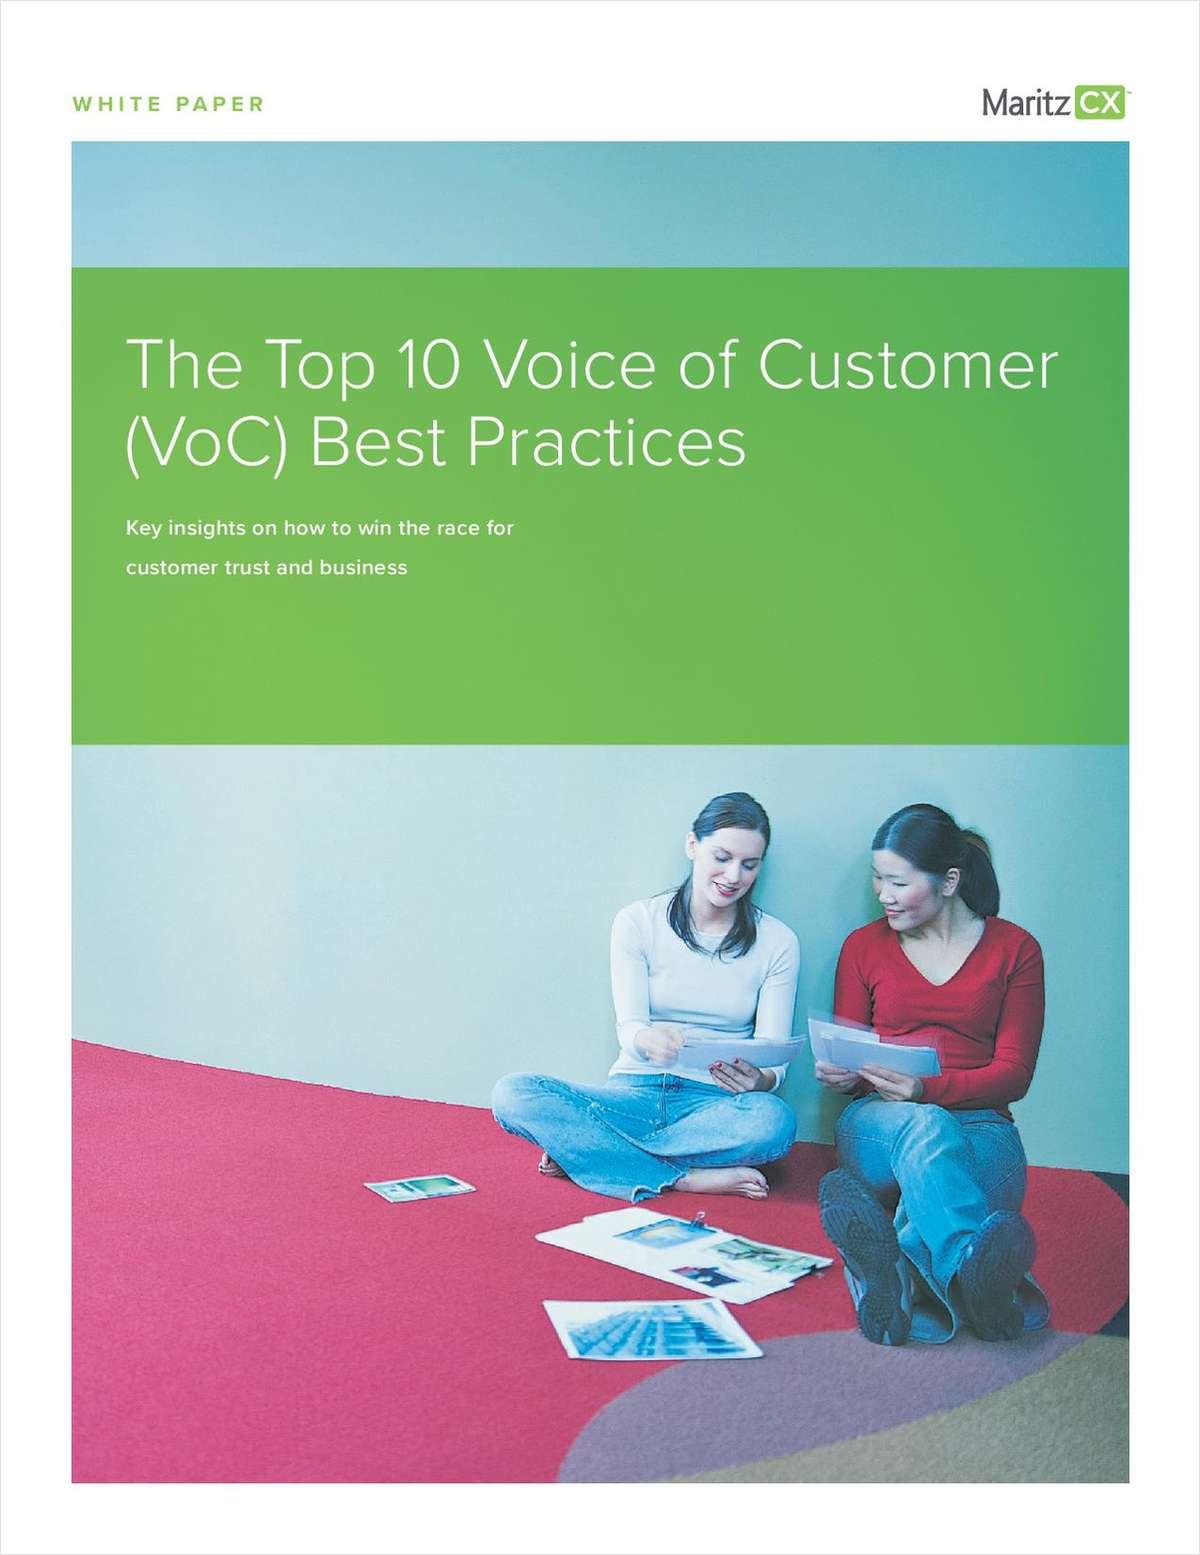 The Top 10 Voice of Customer (VoC) Best Practices